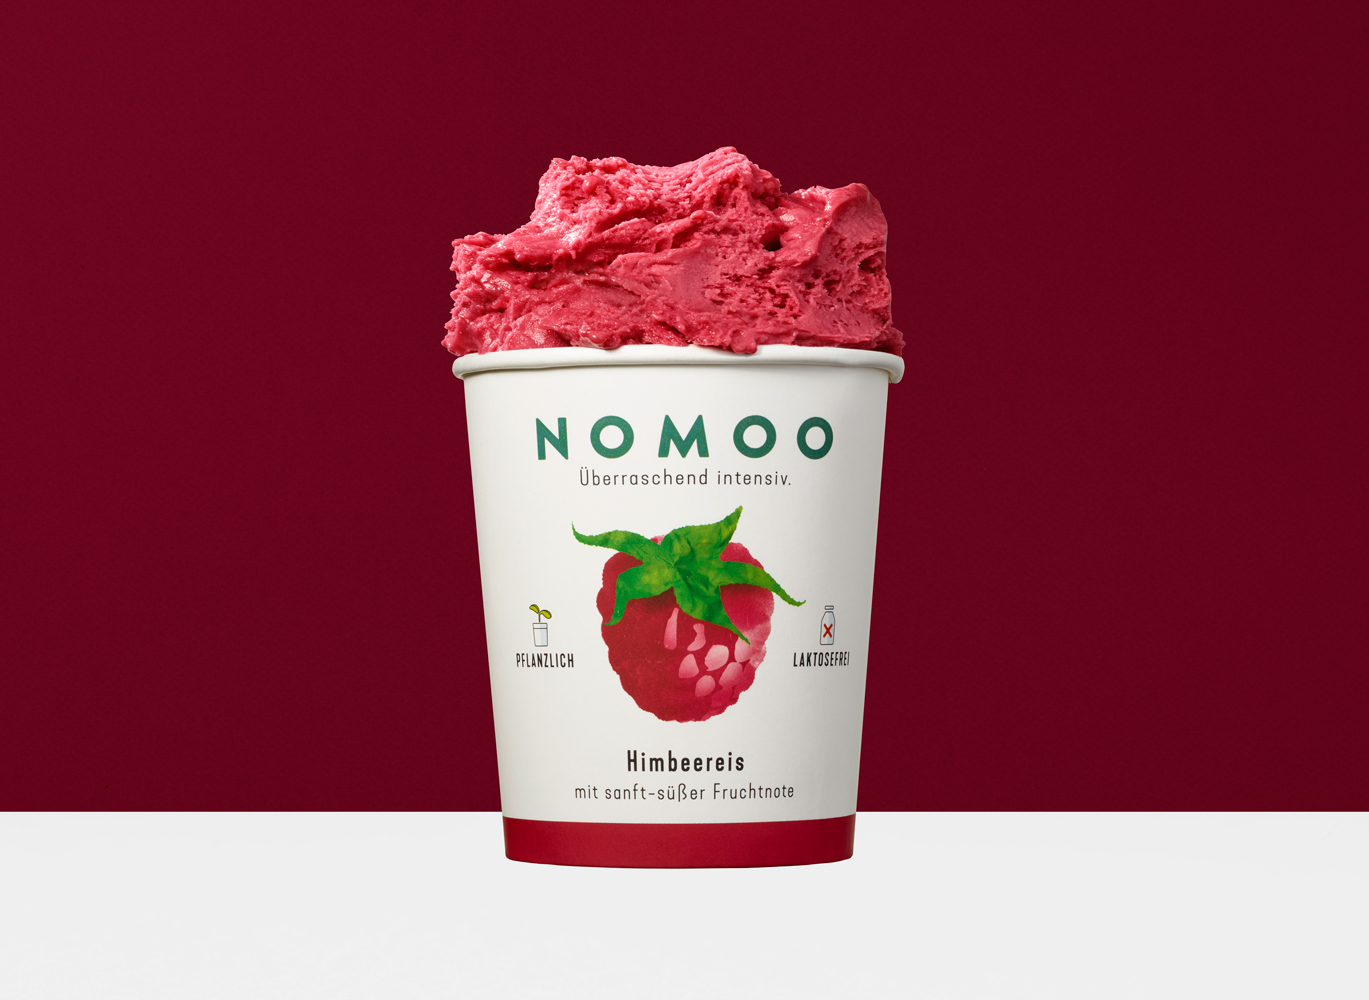 NOMOO-Himbeereis-1369w-1000h-RGB-100P-500ml.jpg